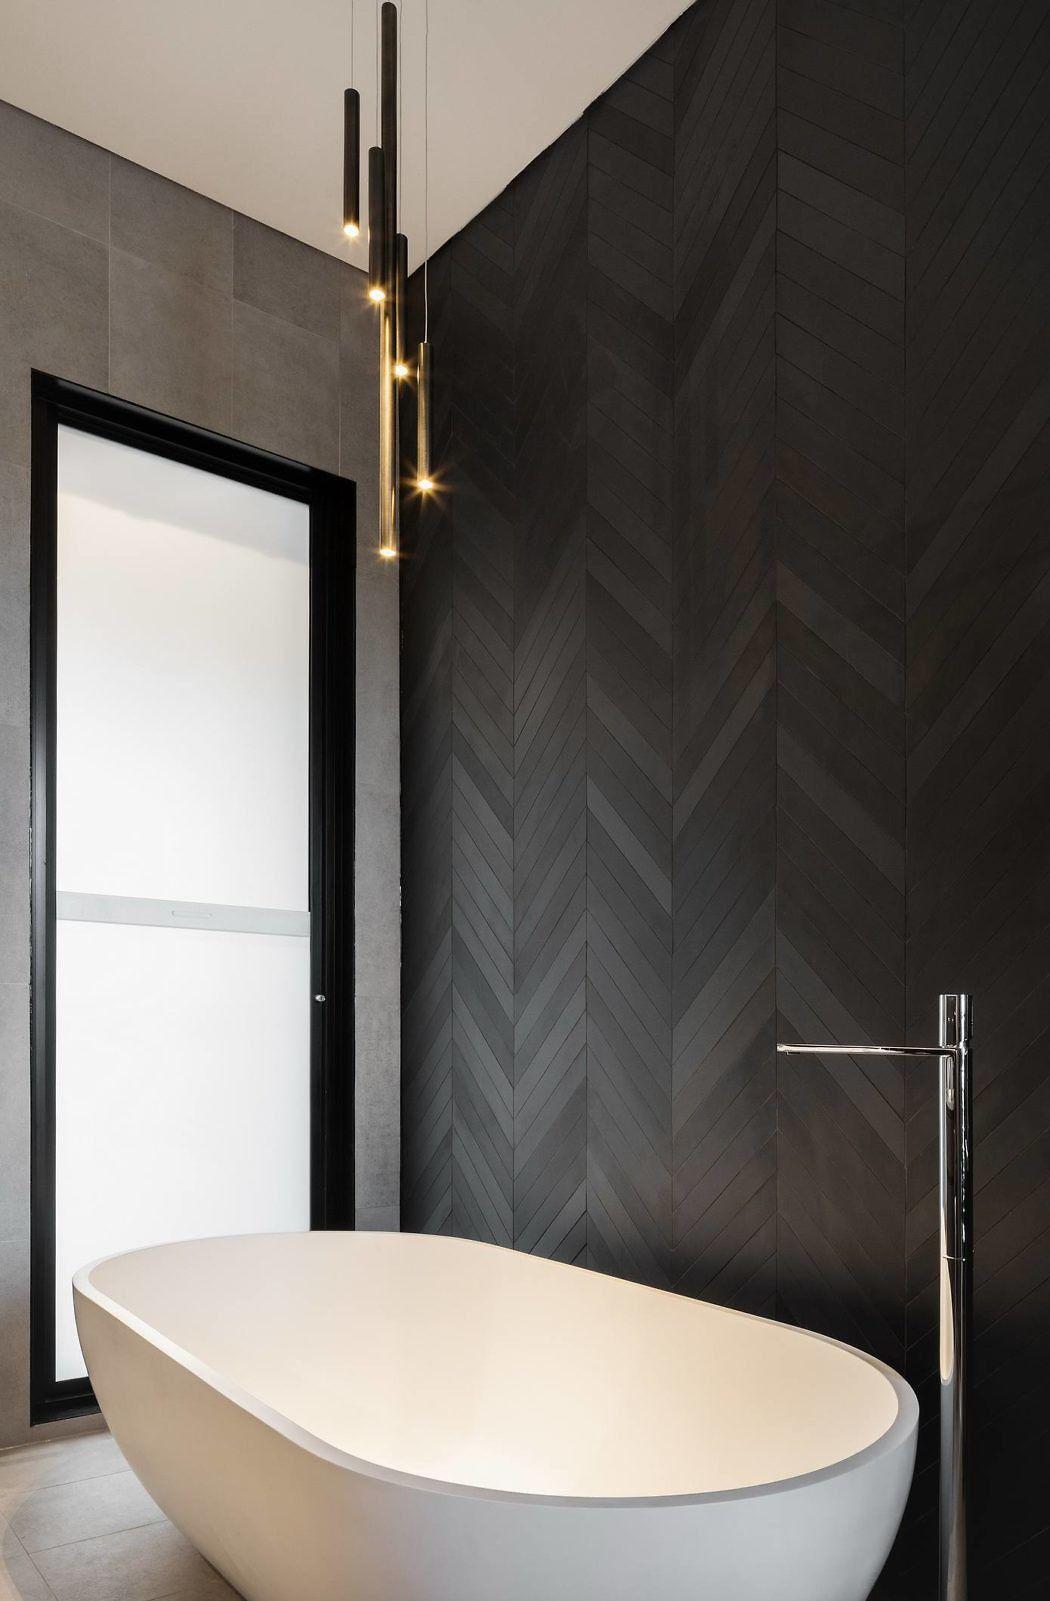 Doorzien House by Bijl Architecture #moderninteriordesign